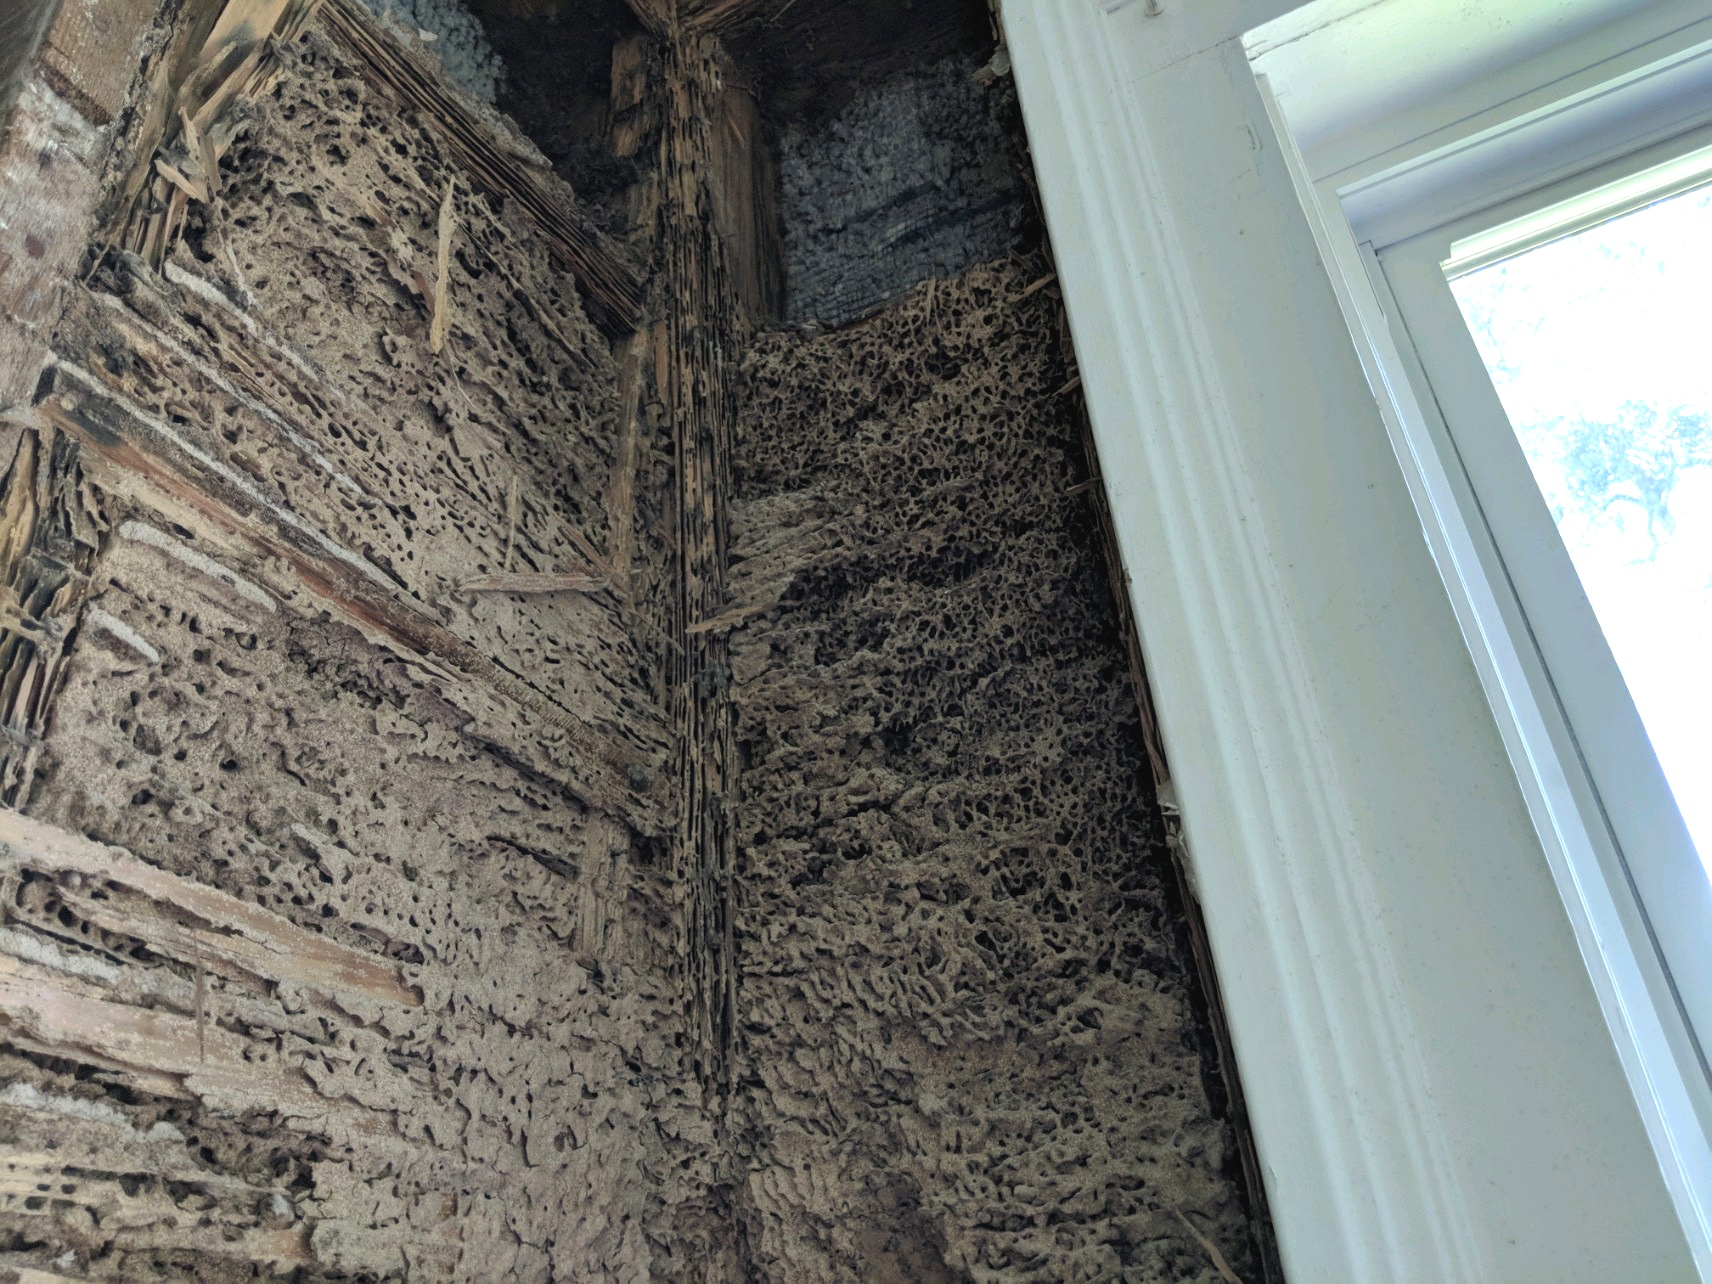 Termite Carton Nest In a House Interior Wall